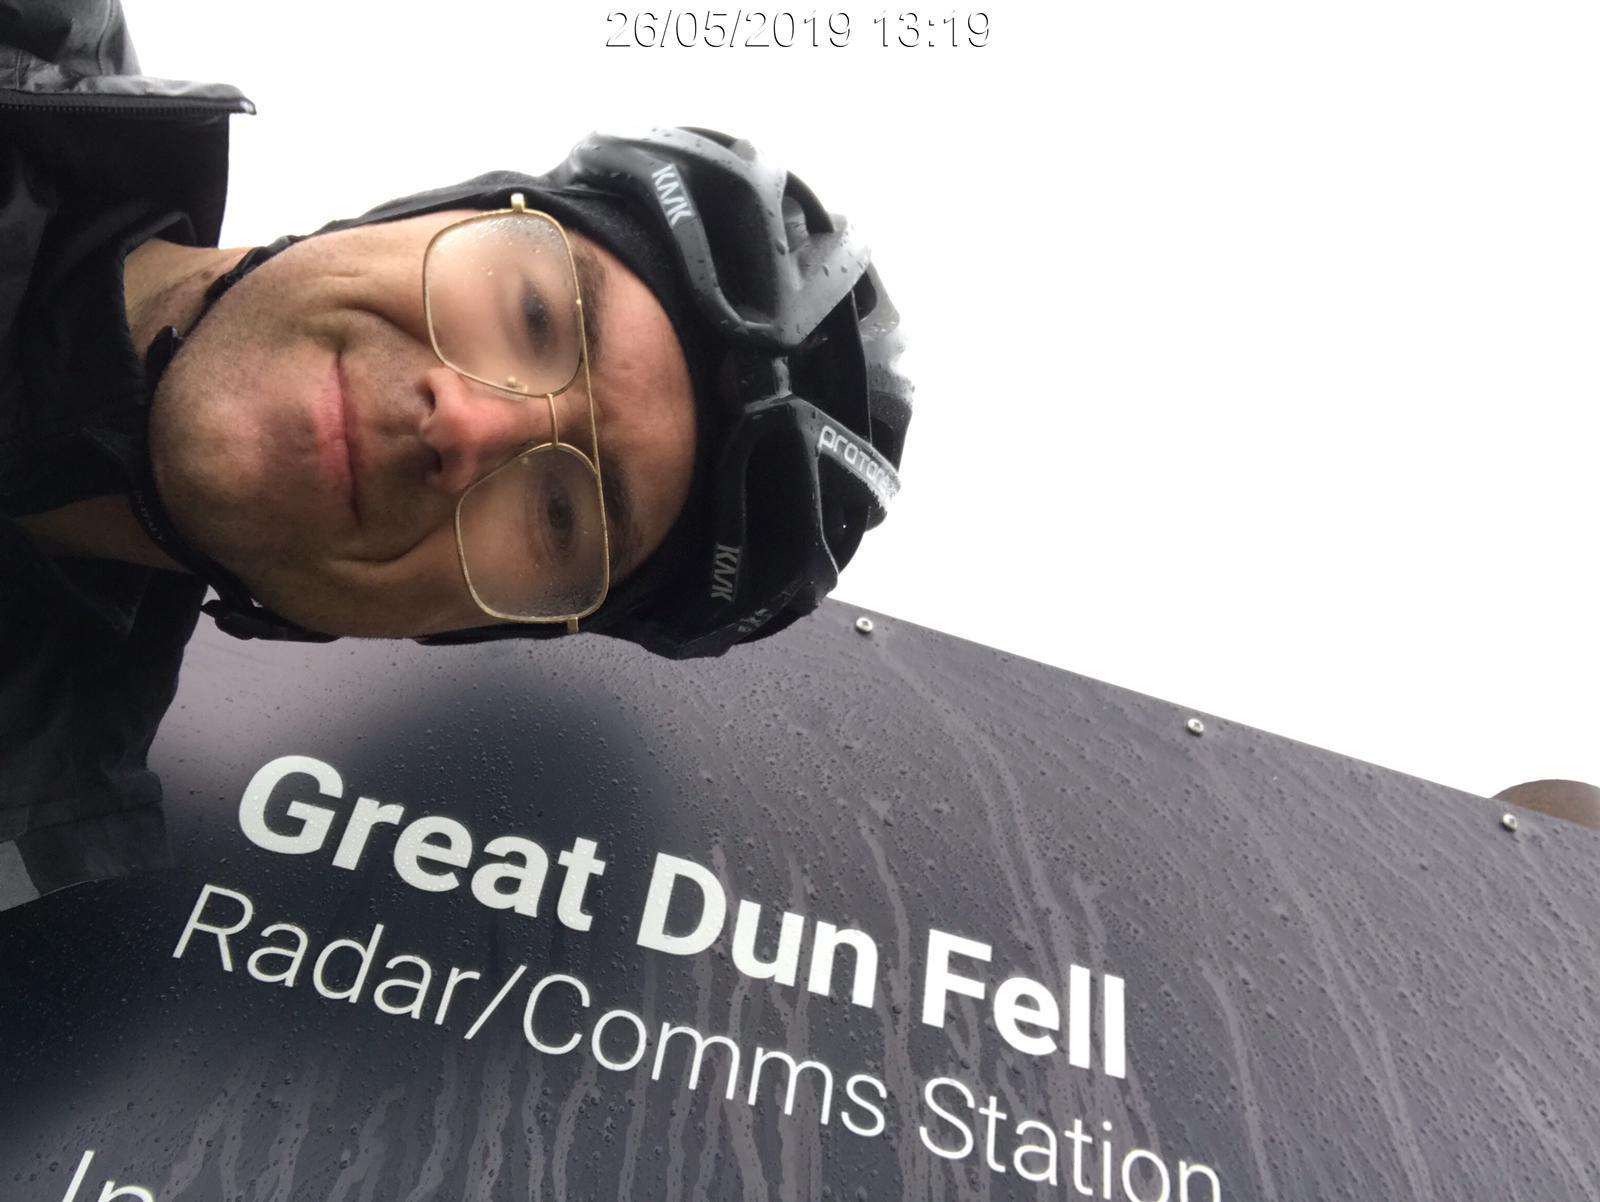 Tim McInnes at Great Dun Fell